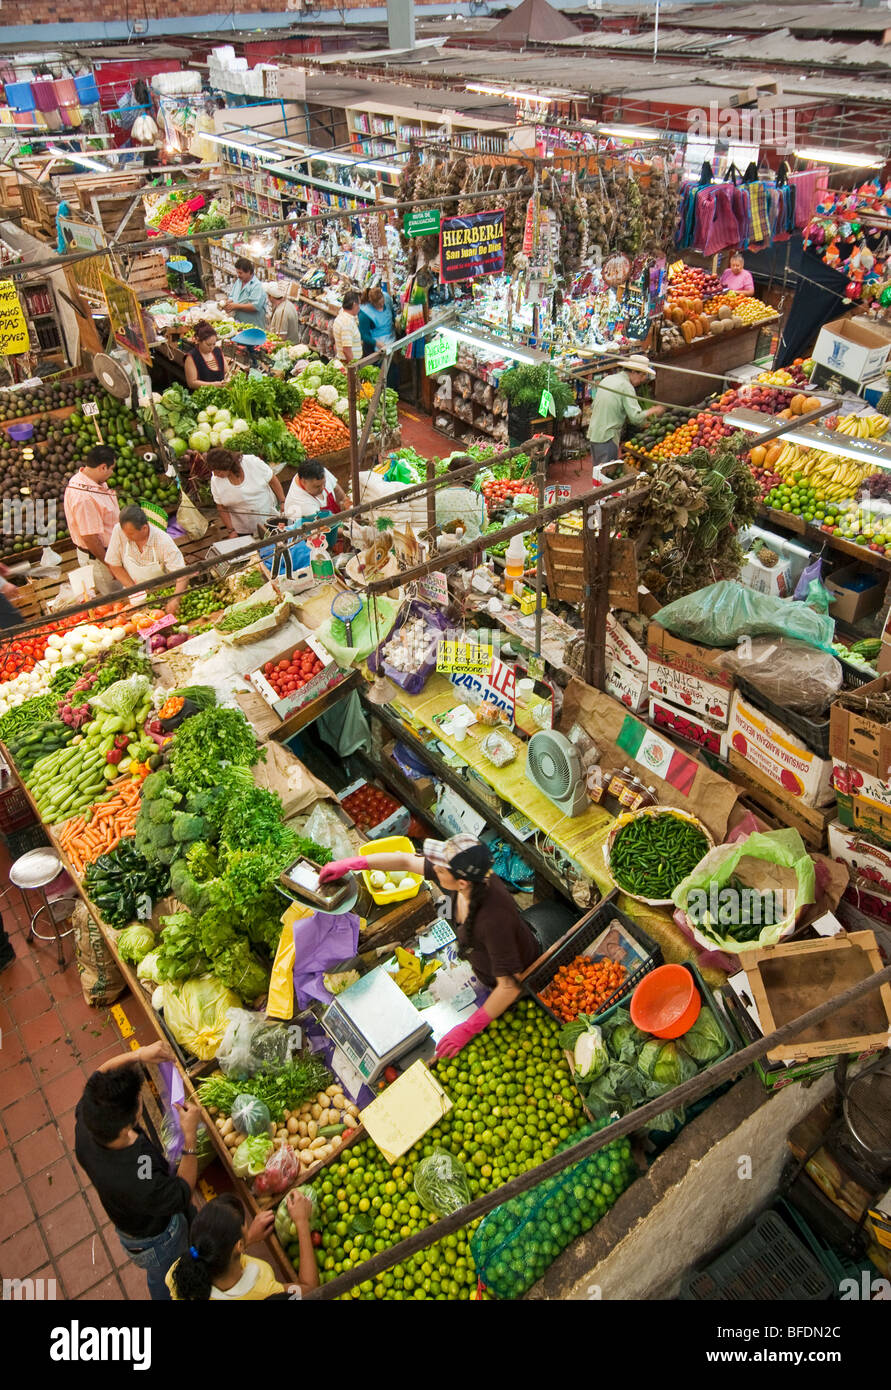 Mercado Libertad, Guadalajara, Mexico. - Stock Image